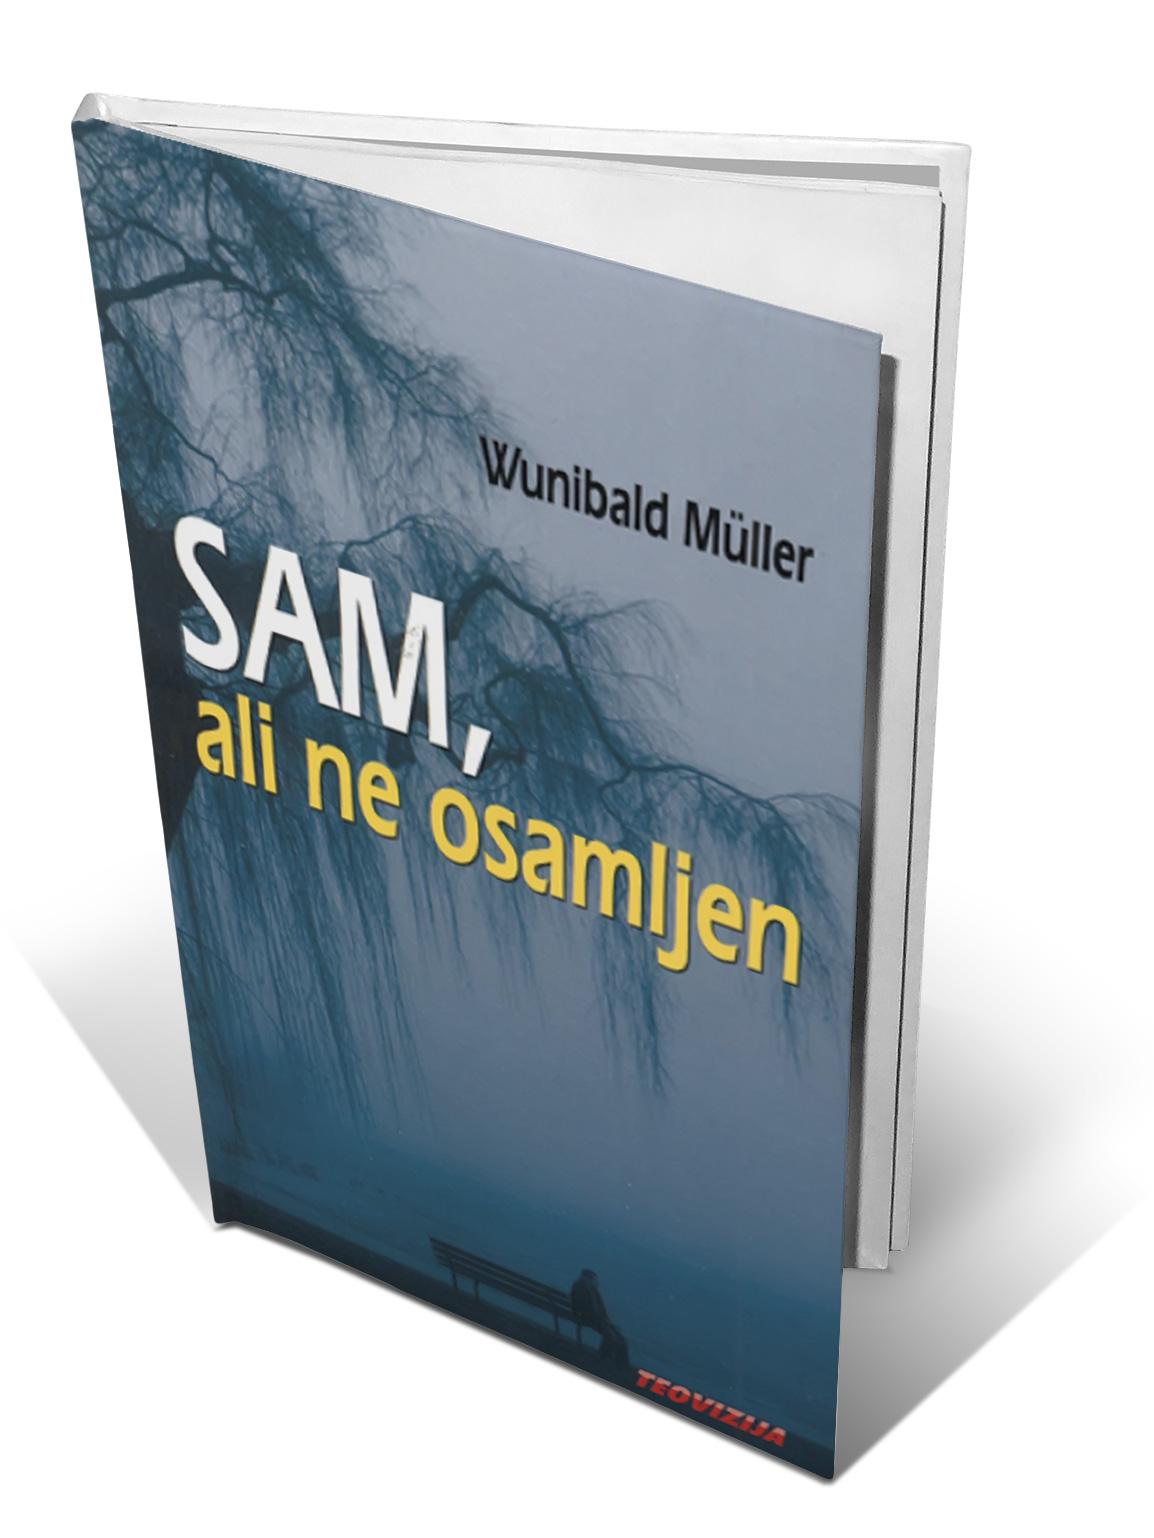 SAM, ALI NE OSAMLJEN - Wunibald Mueller